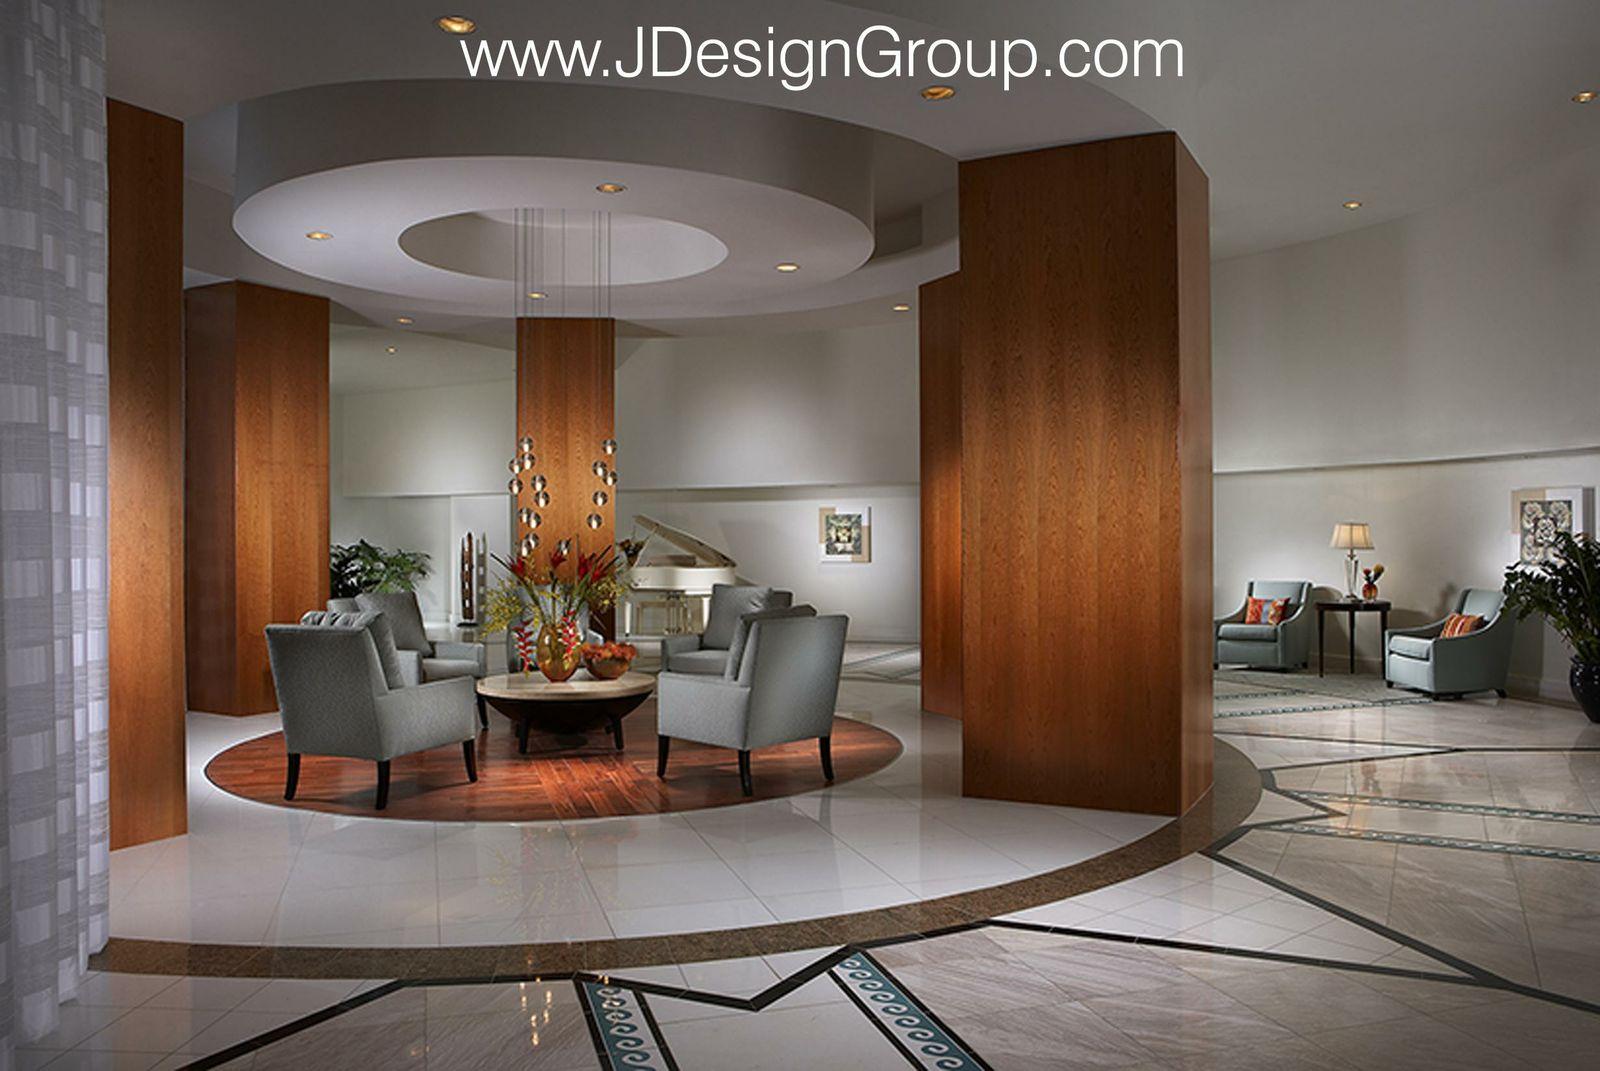 La Gorce Palace Lobby Modern Interior Design